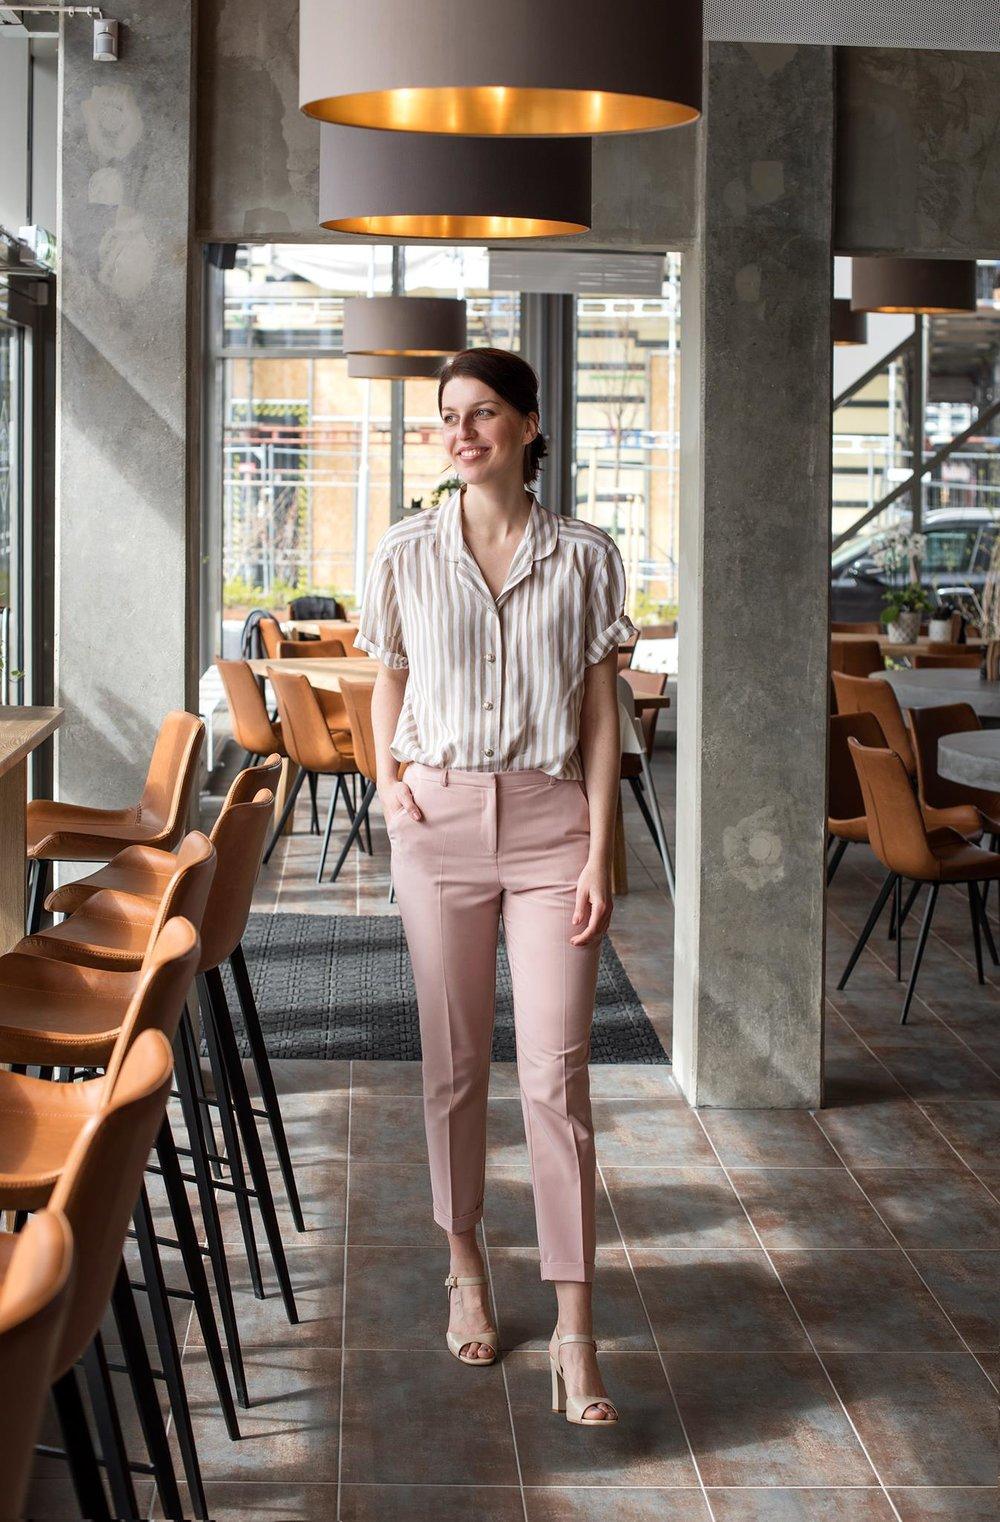 Photoshoot for Asos RU  https://www.asos.com/ru/women/fashion-feed/2017_05_11-thurs/style-files-ellinadaily/